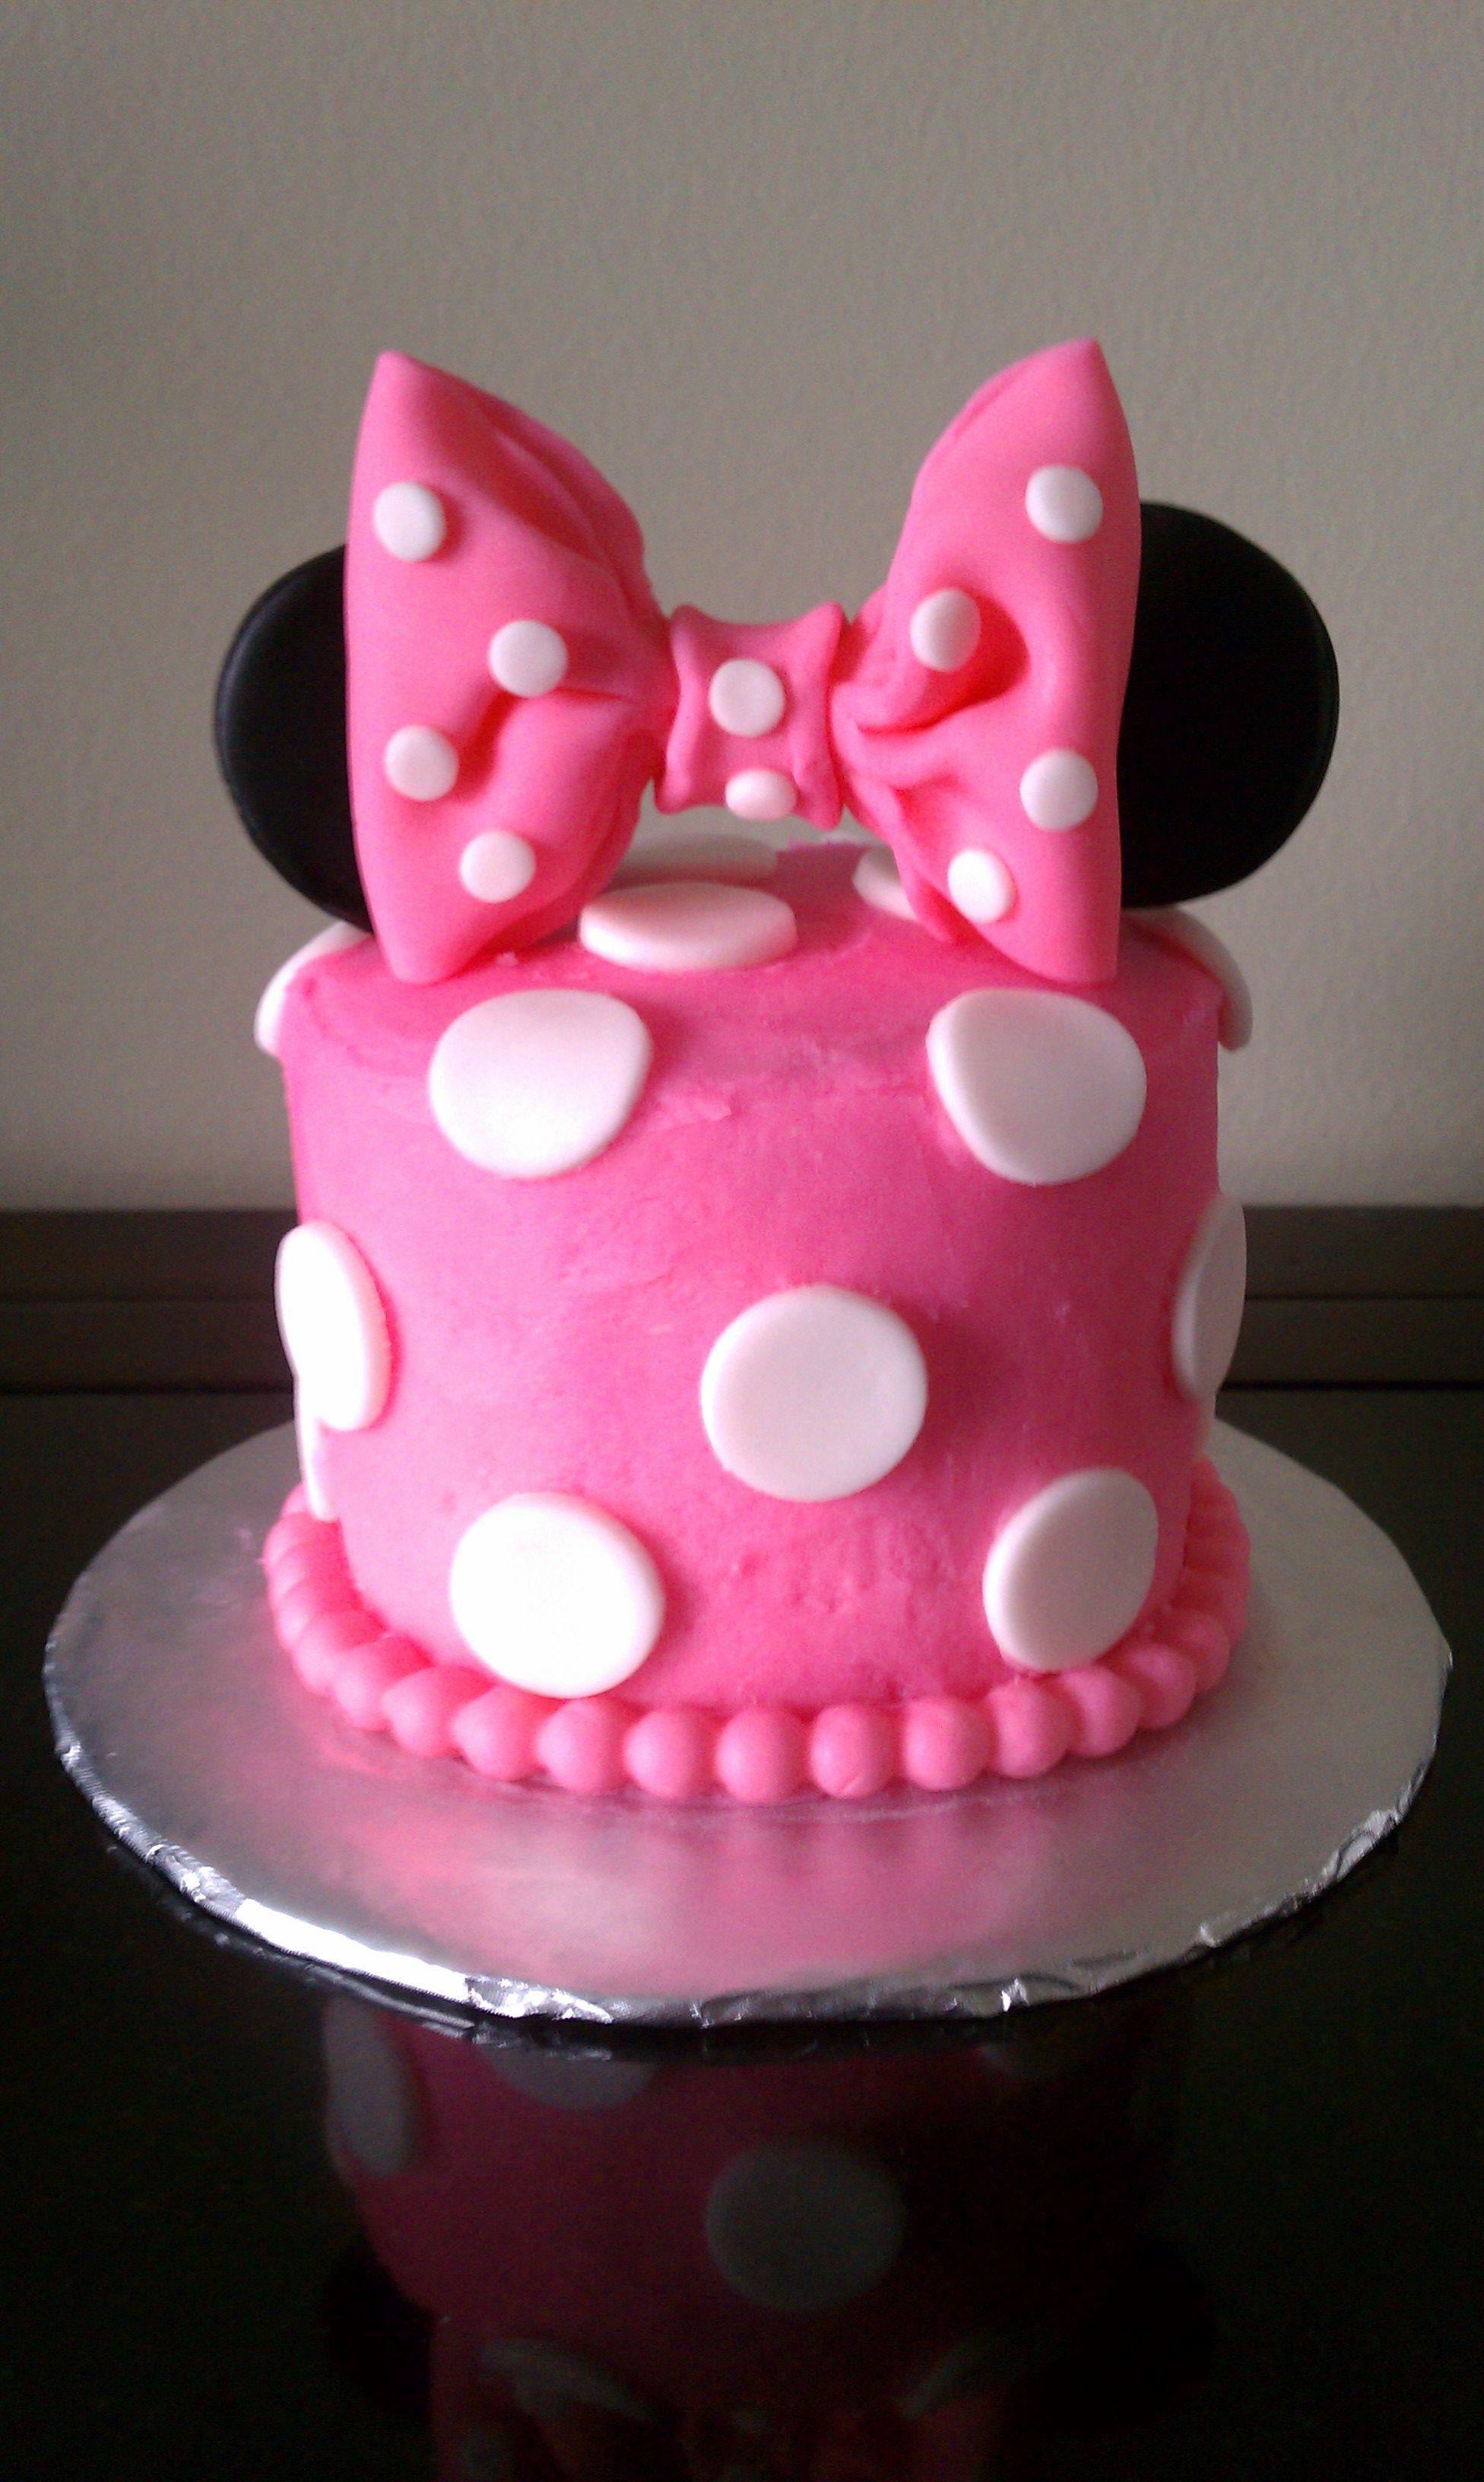 Minnie Mouse 1st Birthday Smash Cake Children S Birthday Cakes Mickey And Minnie Cake Minnie Mouse 1st Birthday First Birthday Cakes